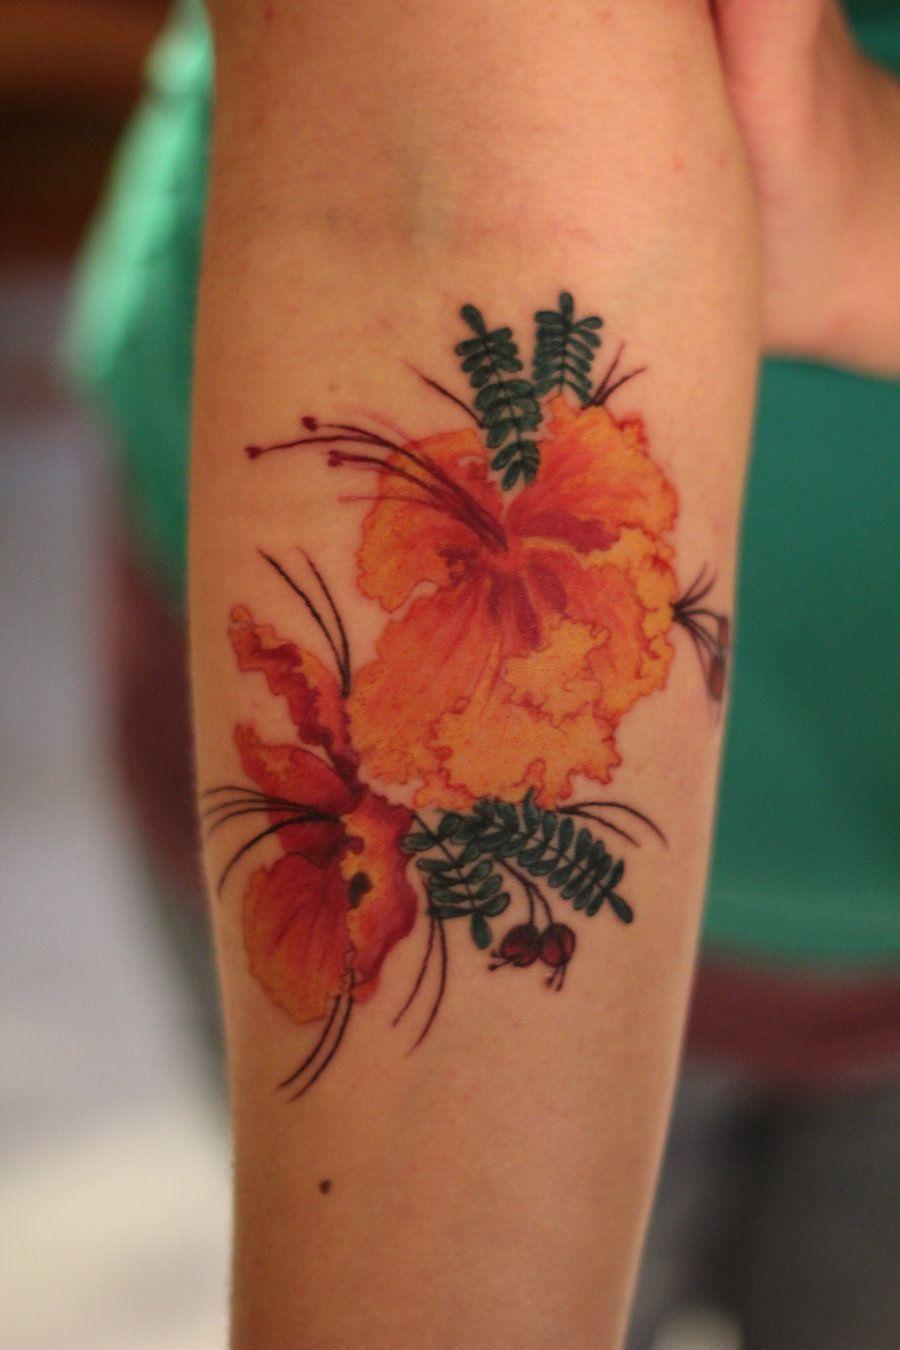 Japanese tattoos feb 27 frog tattoo on foot feb 25 japanese tattoo - Mexican Bird Of Paradise Tattoo By Cello Mint On Deviantart